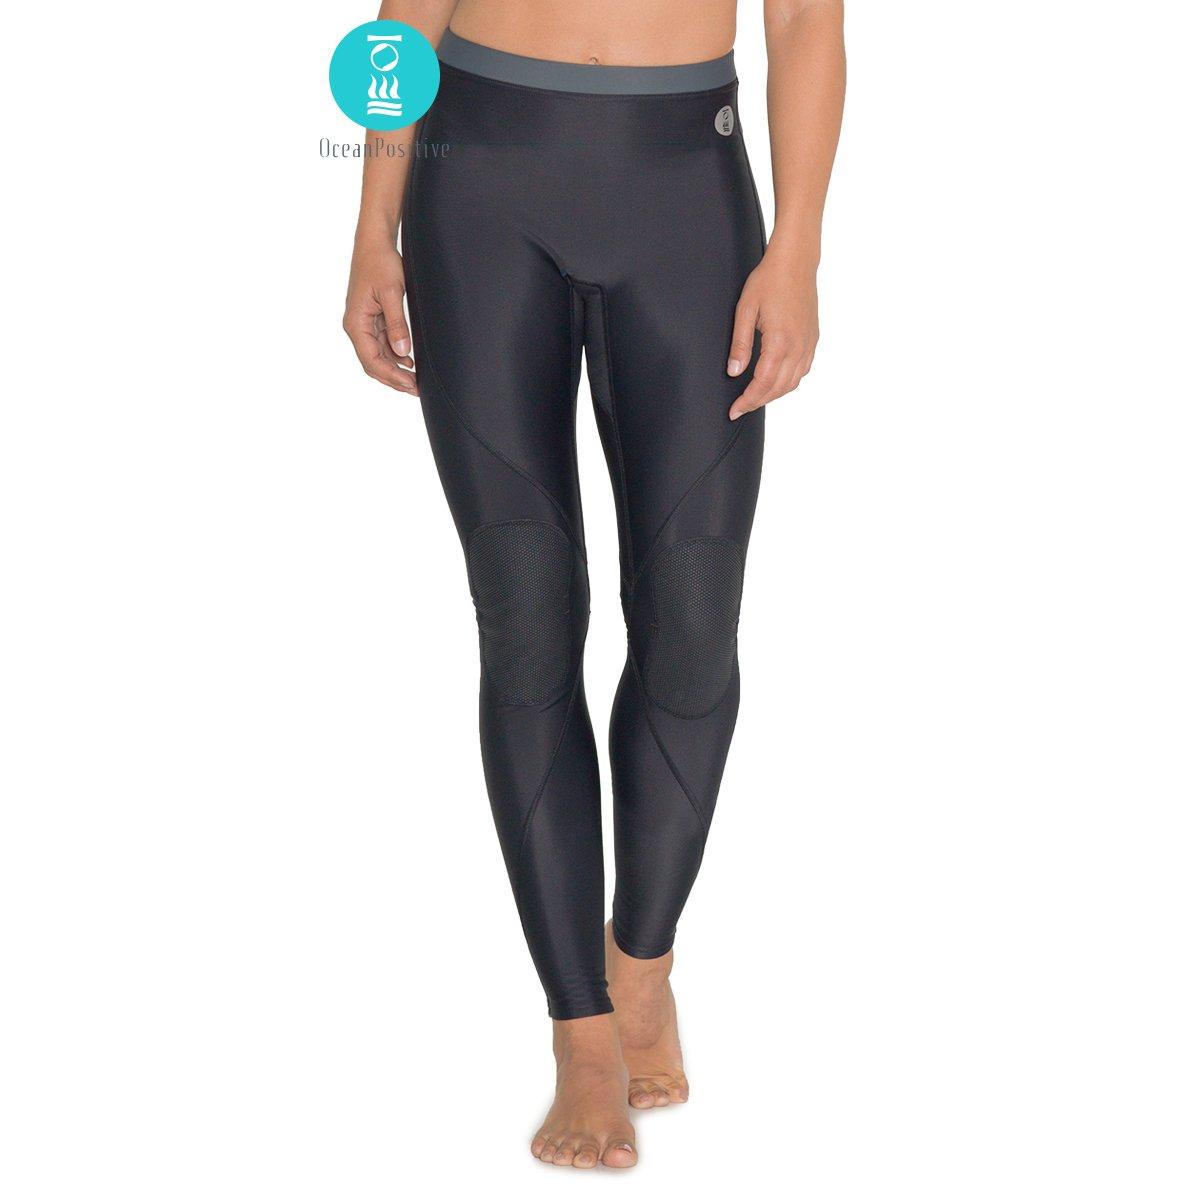 Fourth Element Thermocline Hypoallergenic Nylon Wetsuit Bottoms (Women's) 4 Black